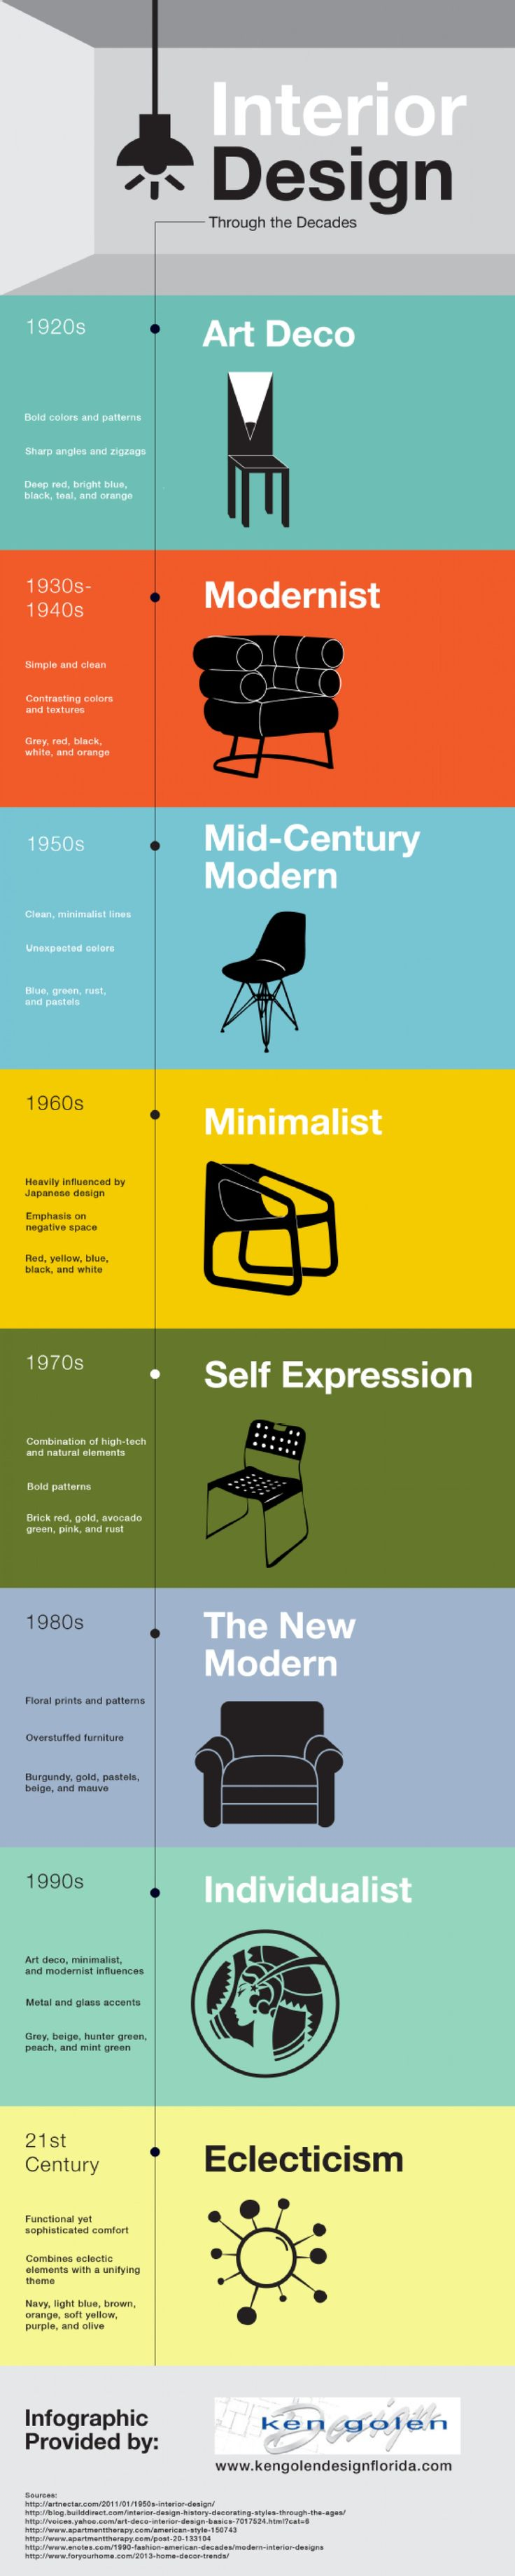 Interior Design through the Decades | Visual.ly